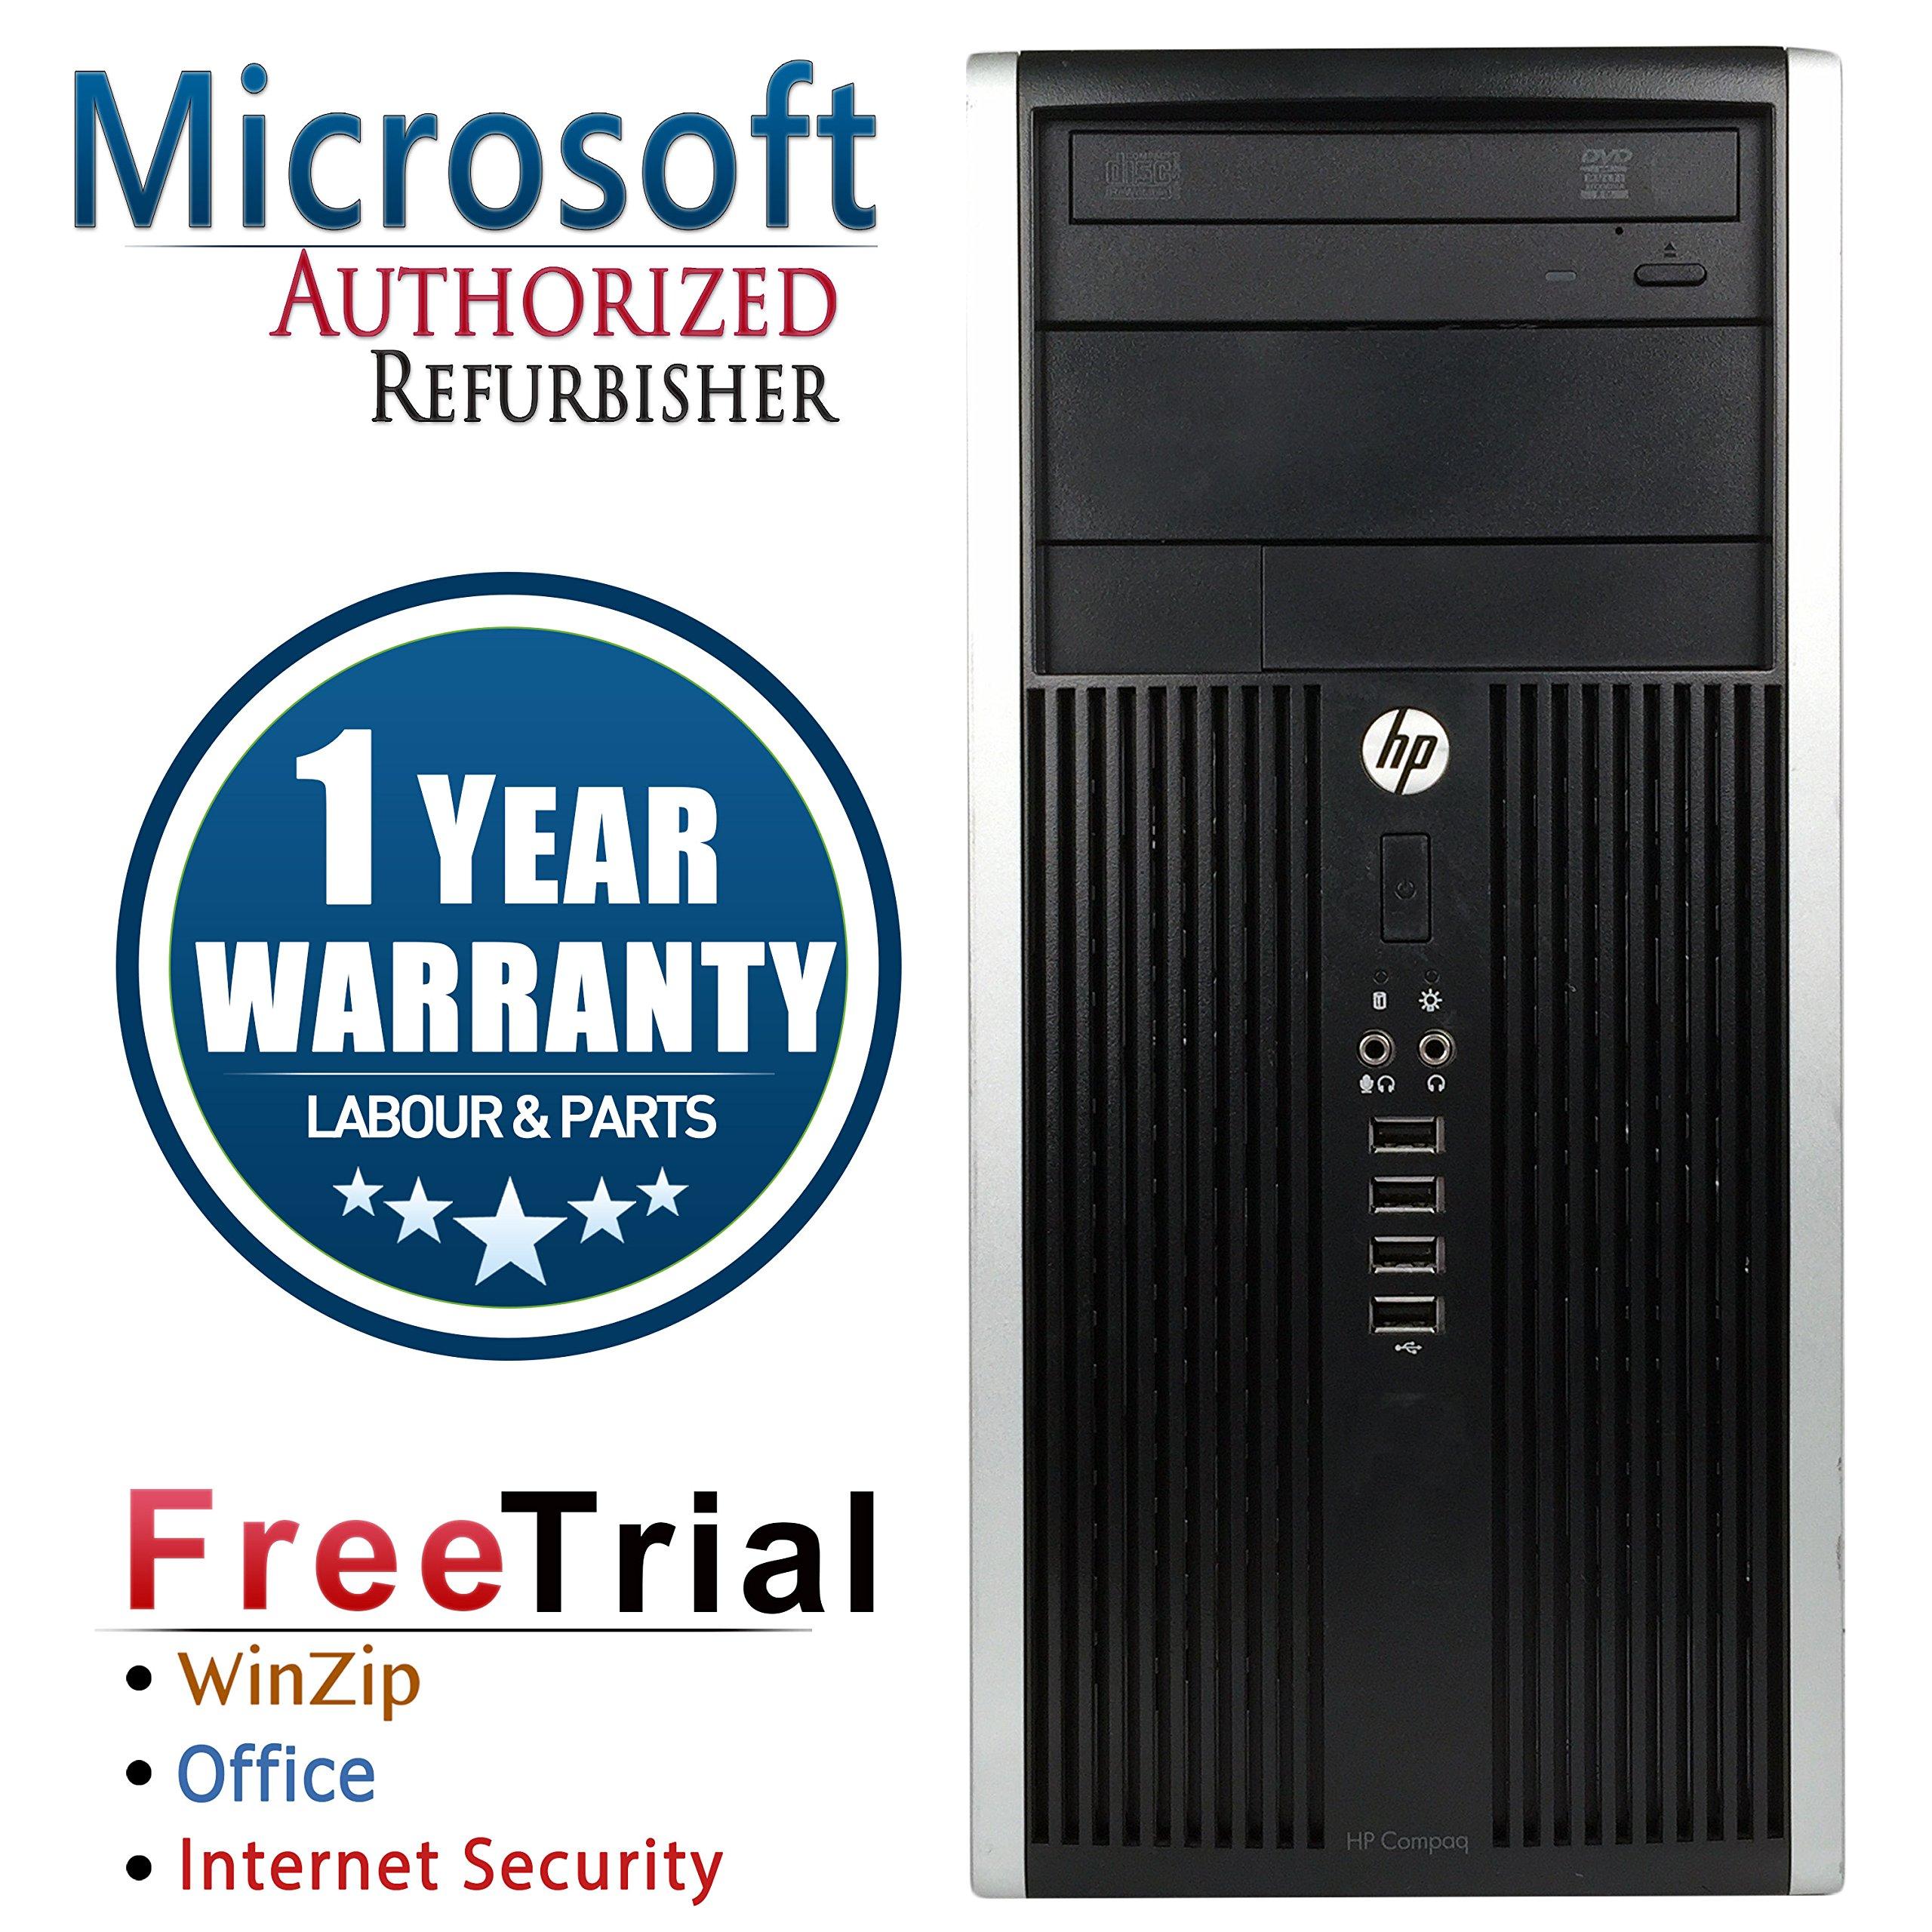 HP 6200 Pro Mini Tower Intel i3-2100 3.1GHz 4GB RAM 320GB HDD Win 10 Home DVD-RW (Certified Refurbished)